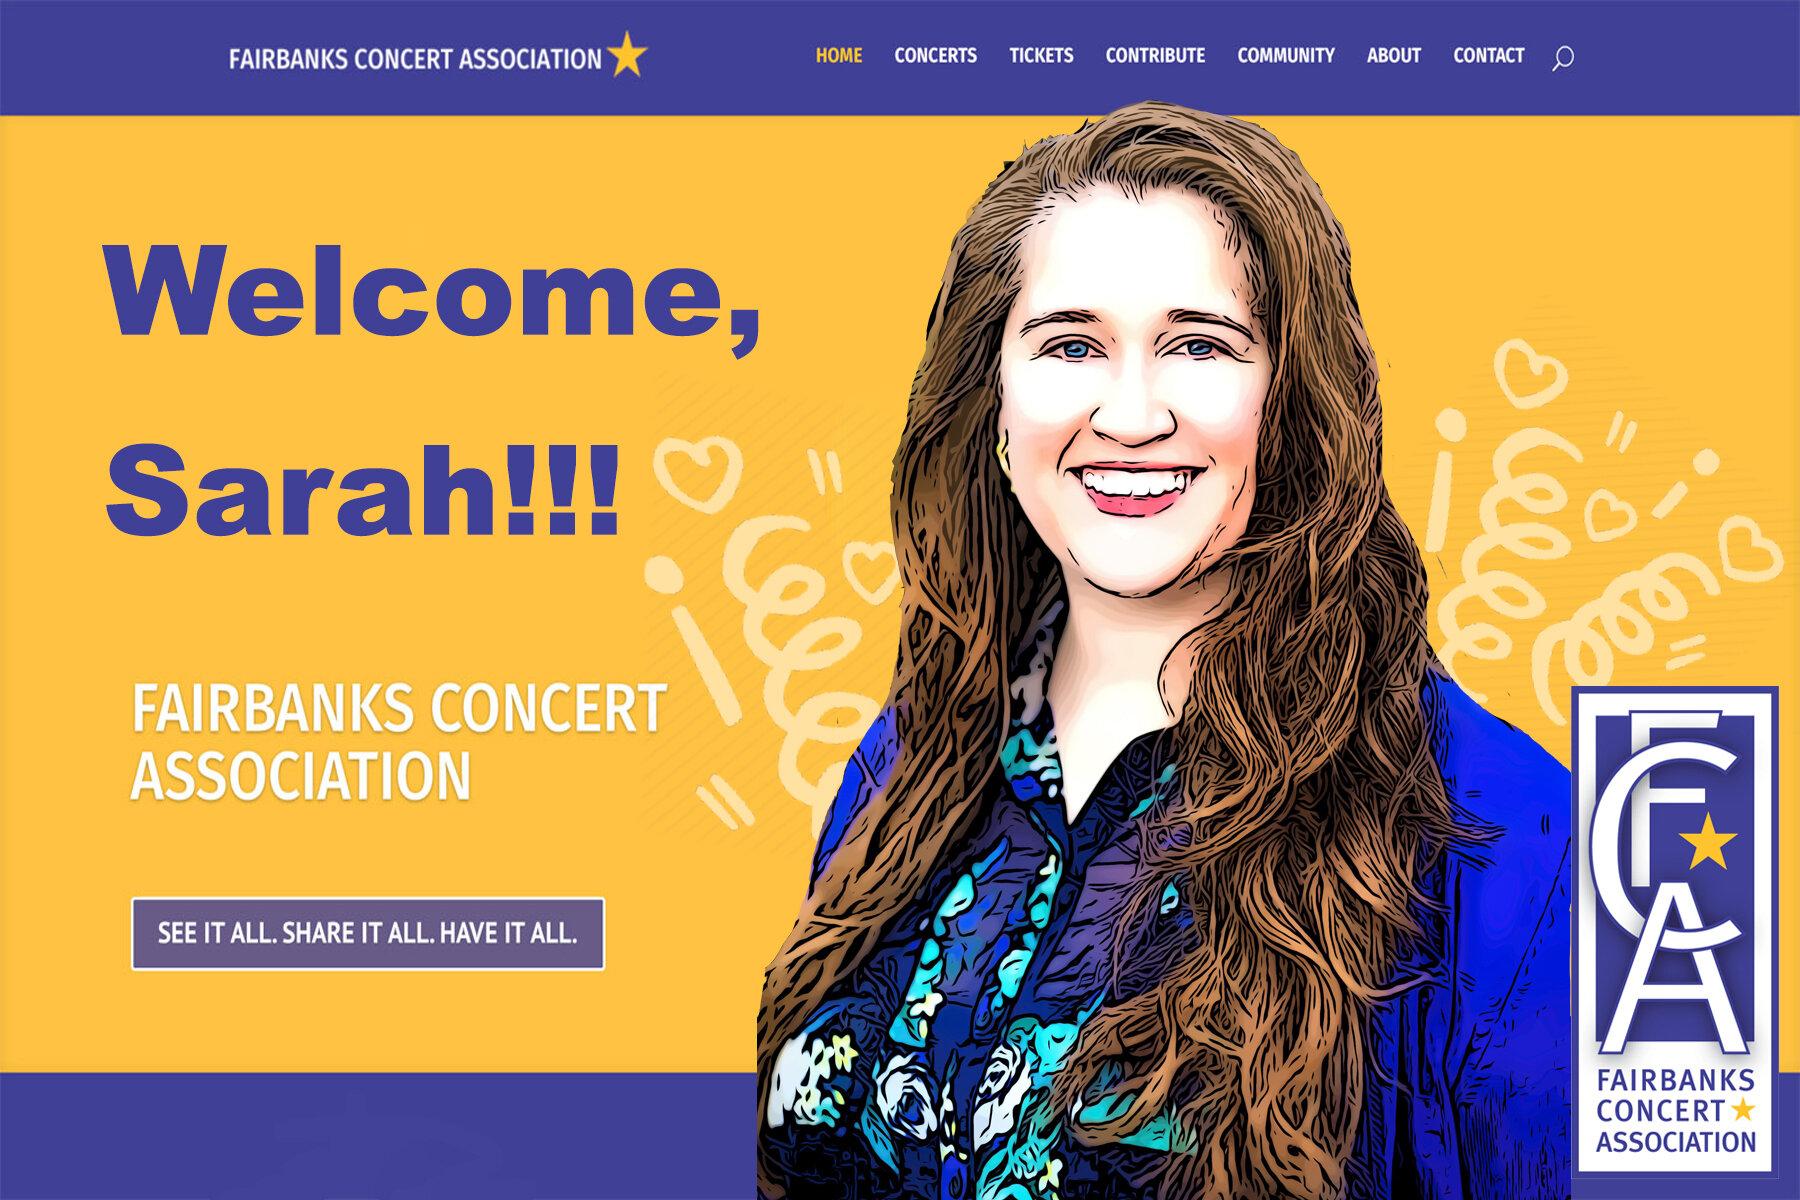 FCA- Welcomes Sarah.jpg